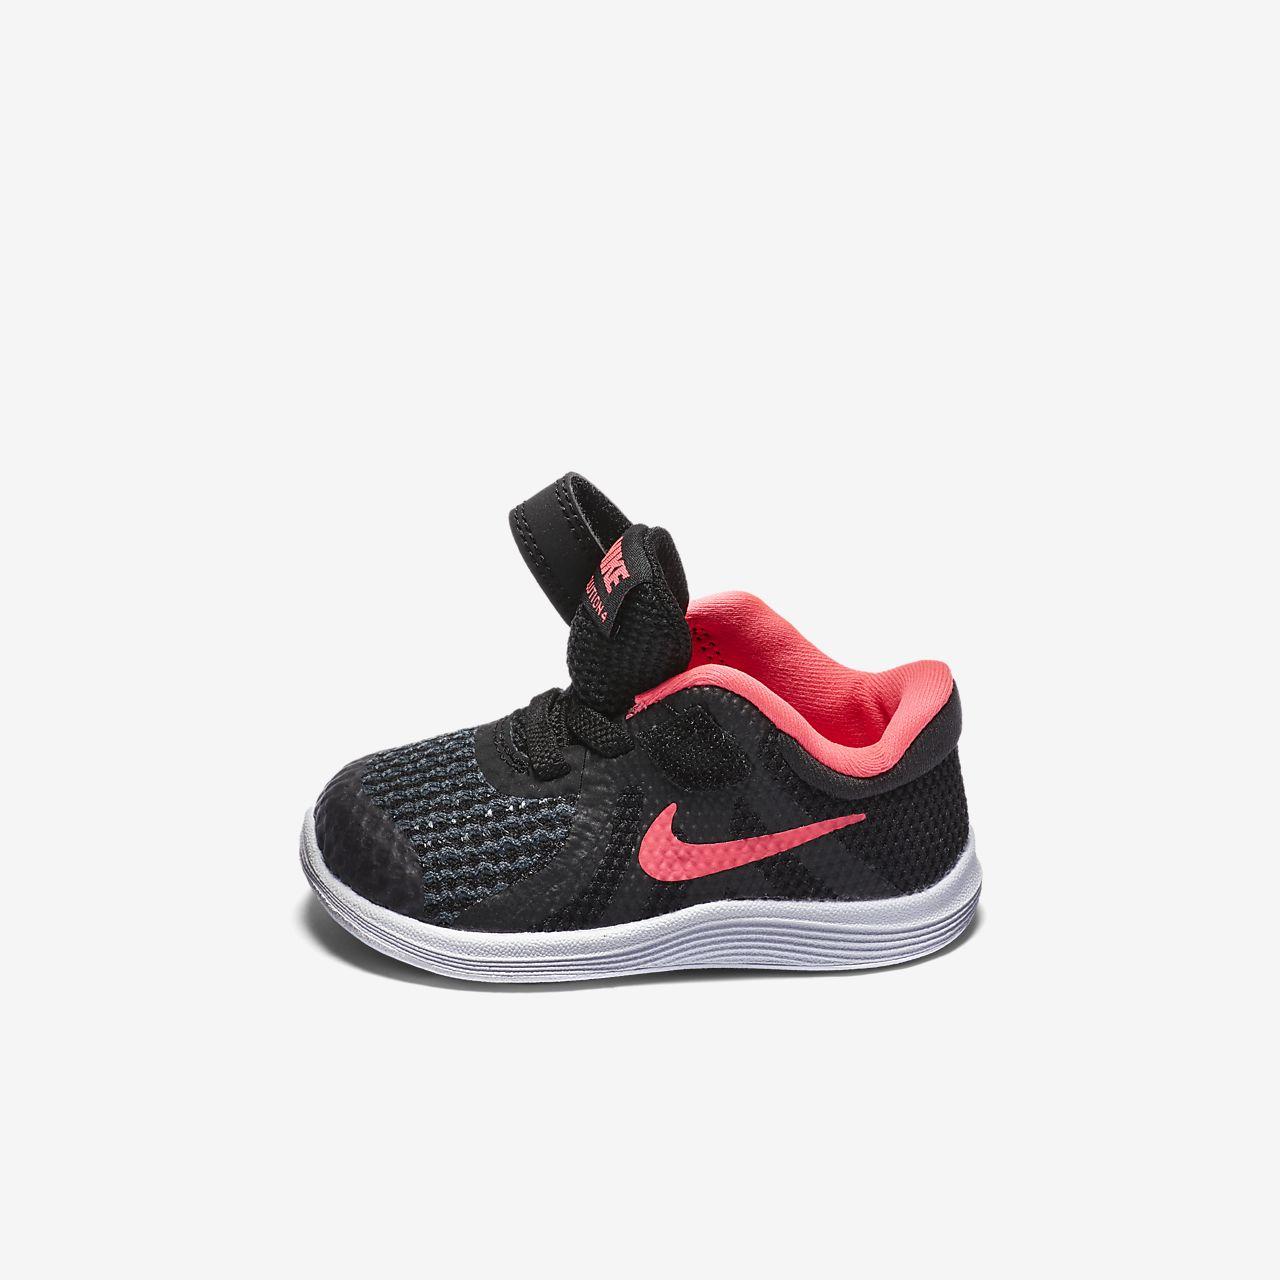 3941206bb35b5 Nike Revolution 4 Baby   Toddler Shoe. Nike.com GB